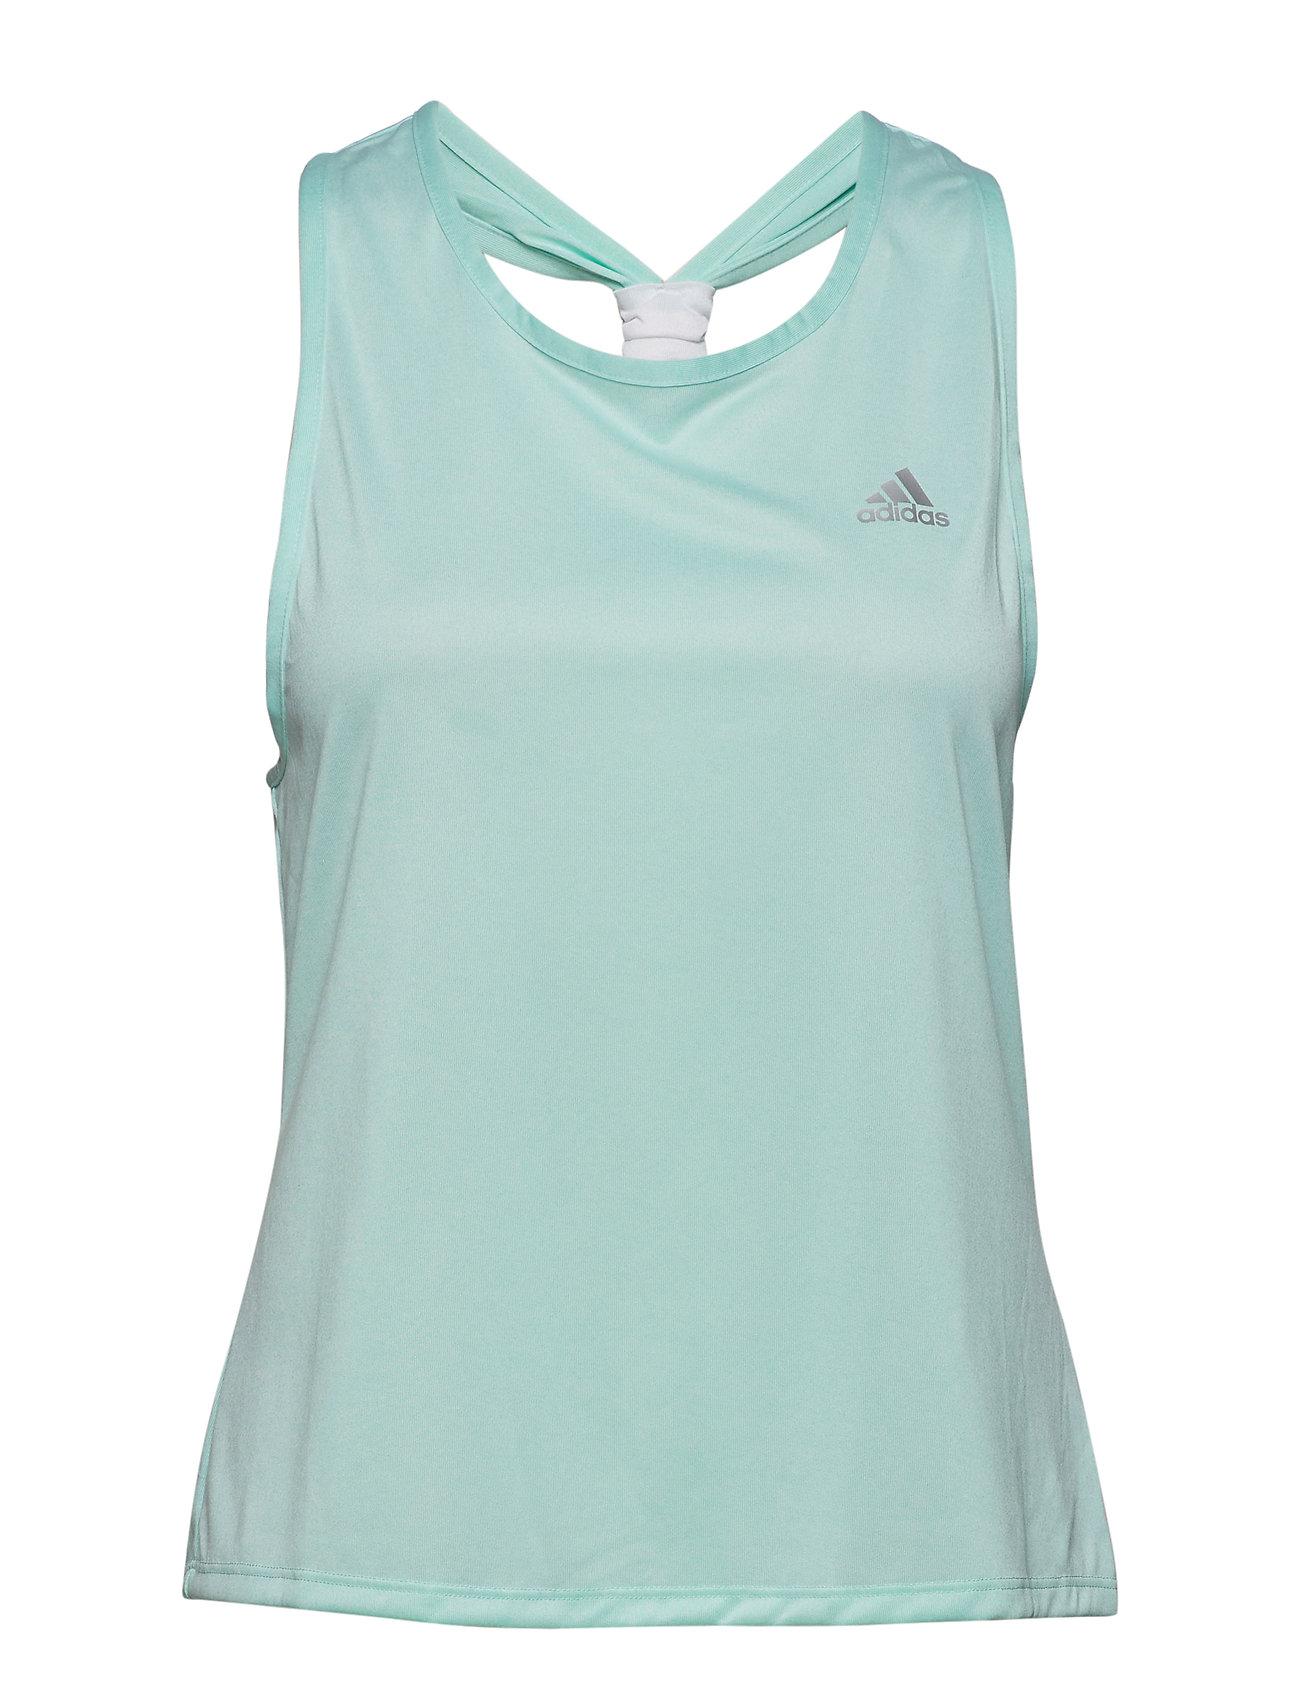 adidas Tennis CLUB TIEBACK TANK W - GREEN